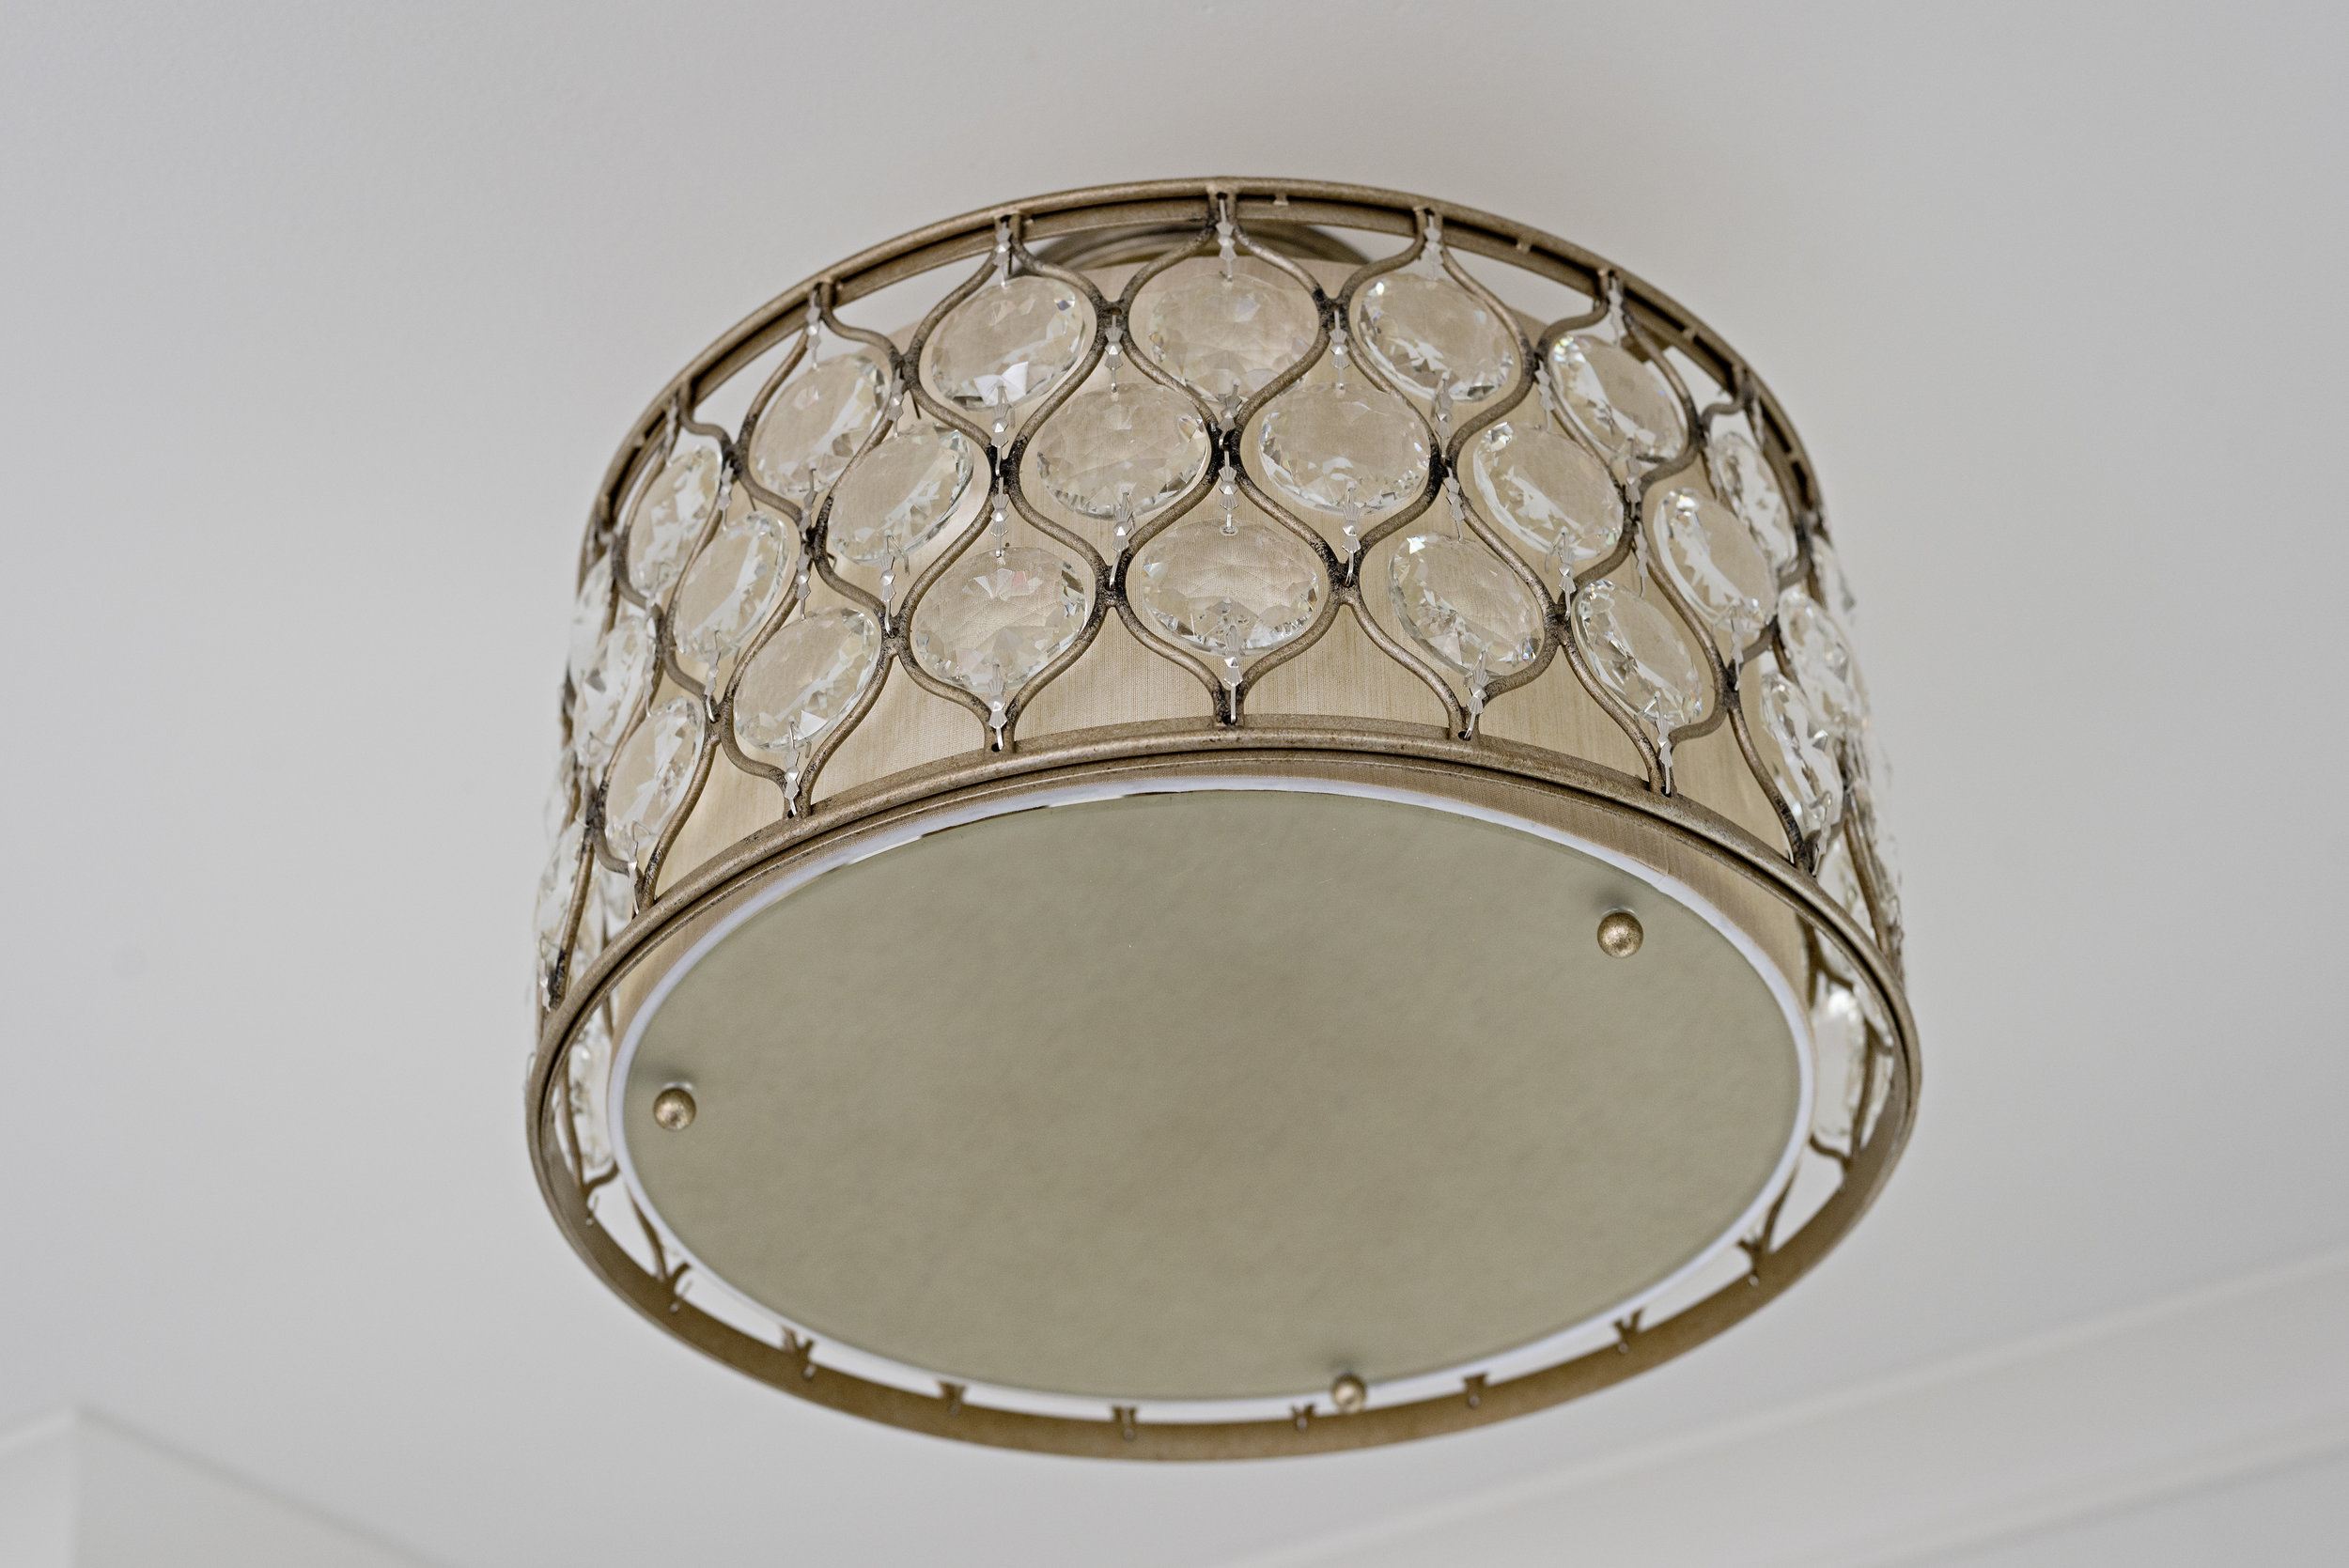 semi flushmount brass glass crystal transitional design light fixture.jpg